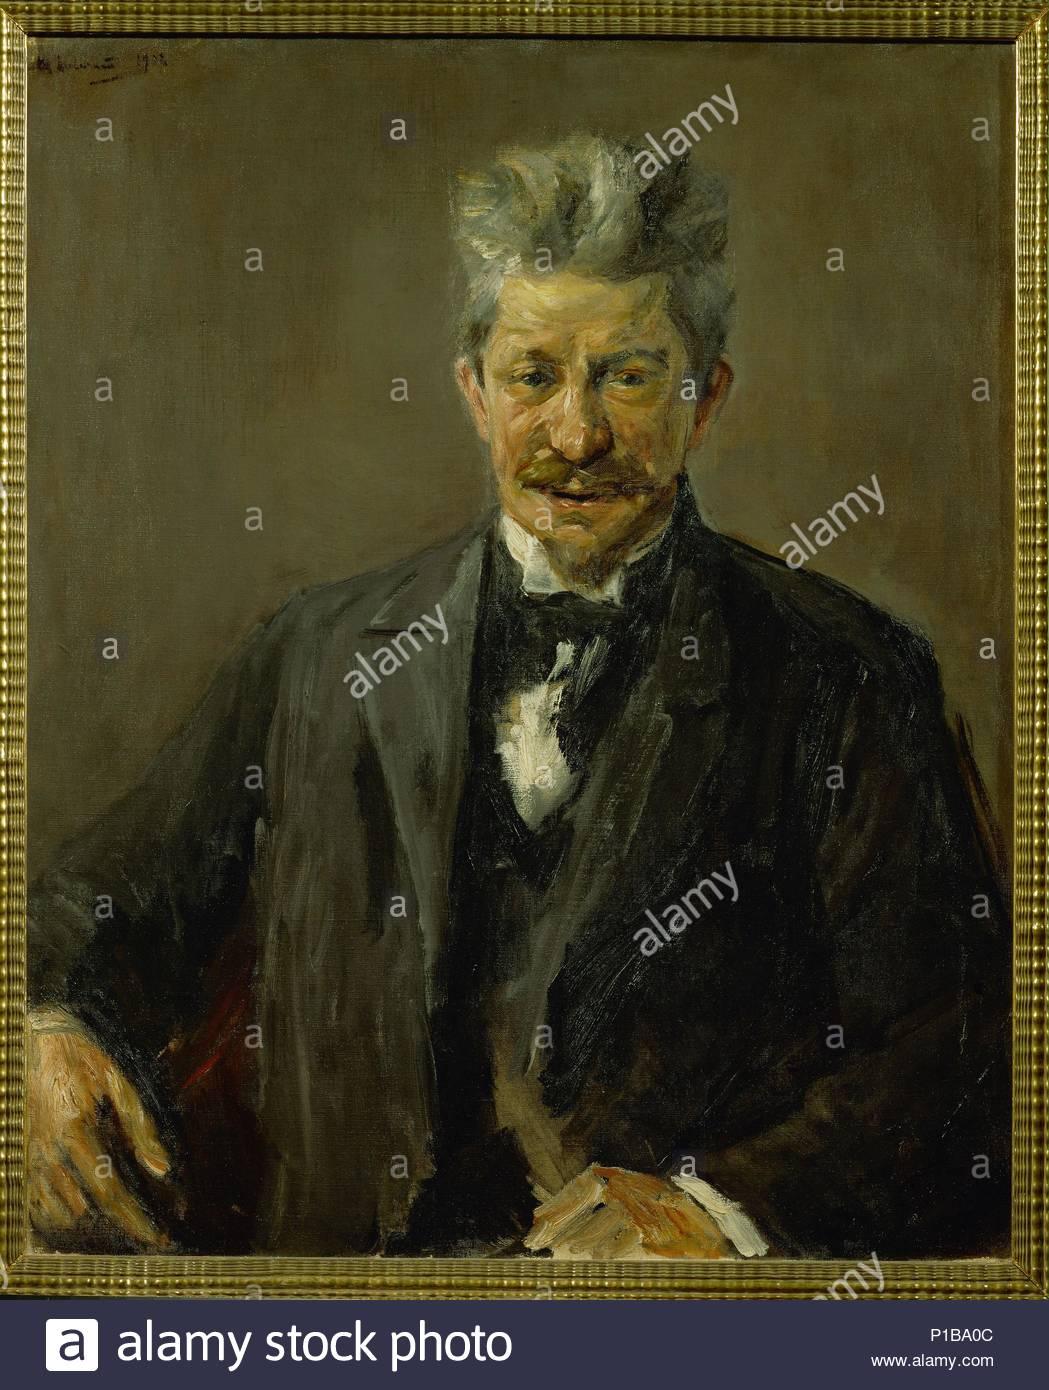 Portrait Georg Brandes, Danish art critic (1842-1927) 1902 Canvas, 82,5 x 66,5 cm Inv.336 1912 / 1. Author: Max Liebermann (1847-1935). Location: Kunsthalle, Bremen, Germany. - Stock Image